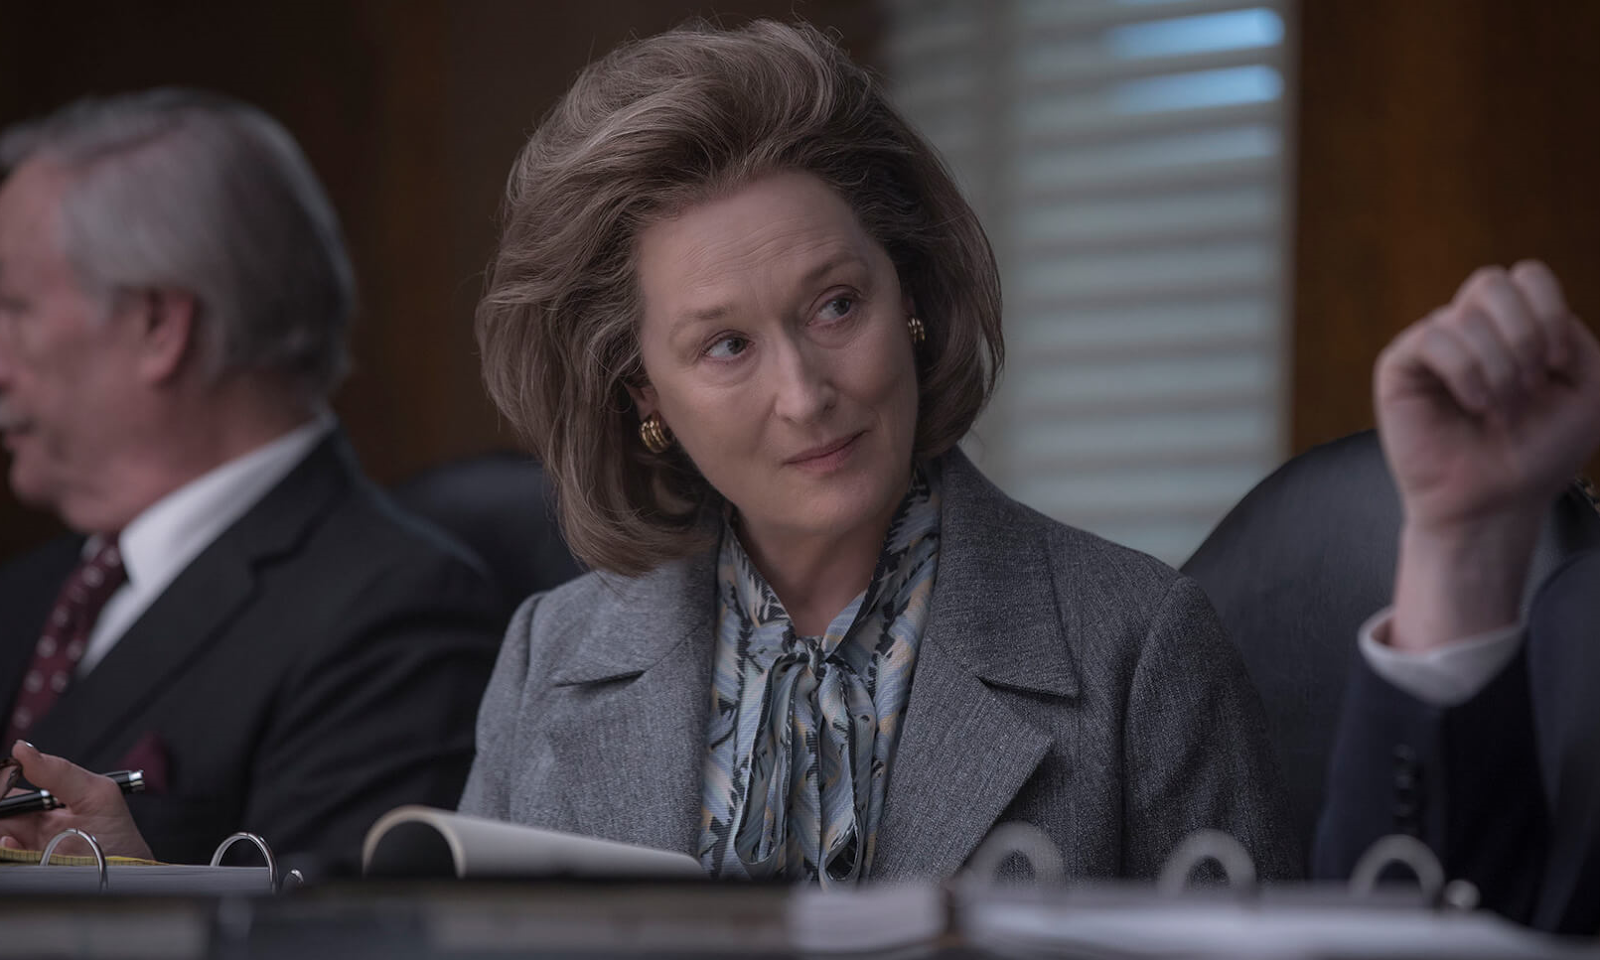 Meryl Streep in The Post movie